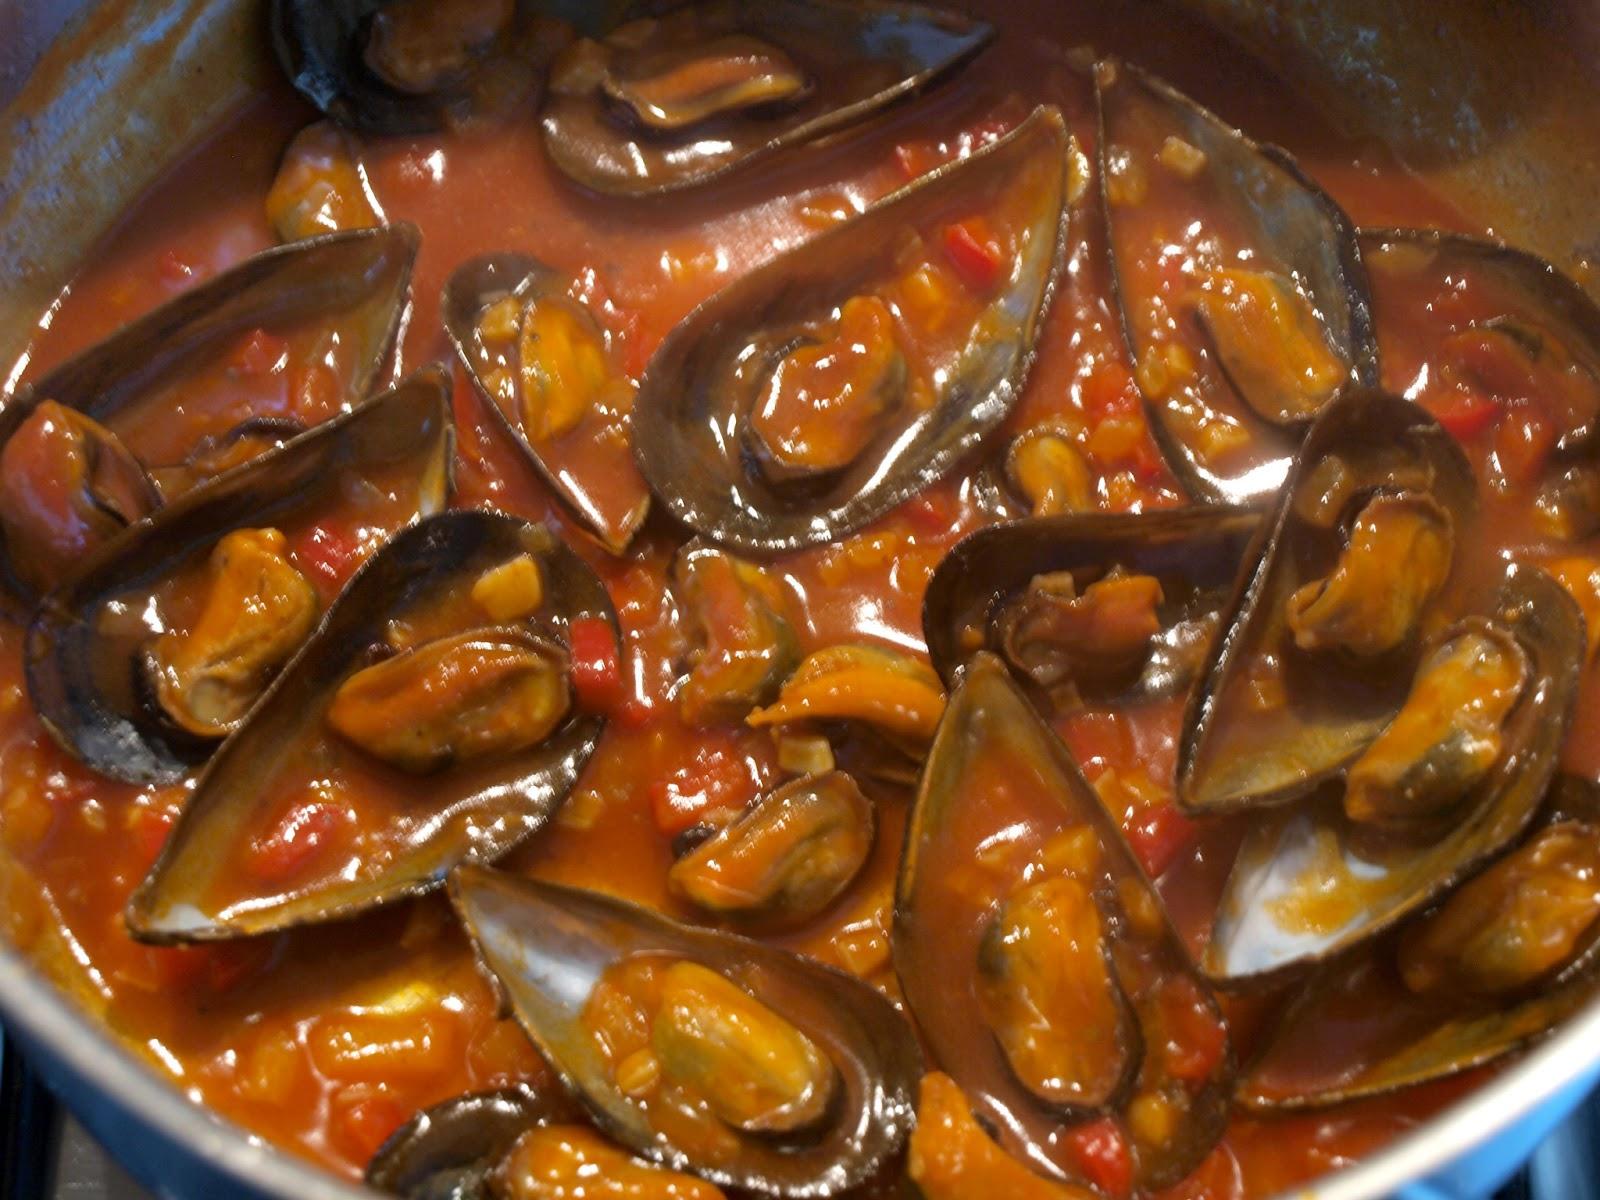 La larpeira sin gluten mejillones en salsa de tomate for Cocinar mejillones en salsa